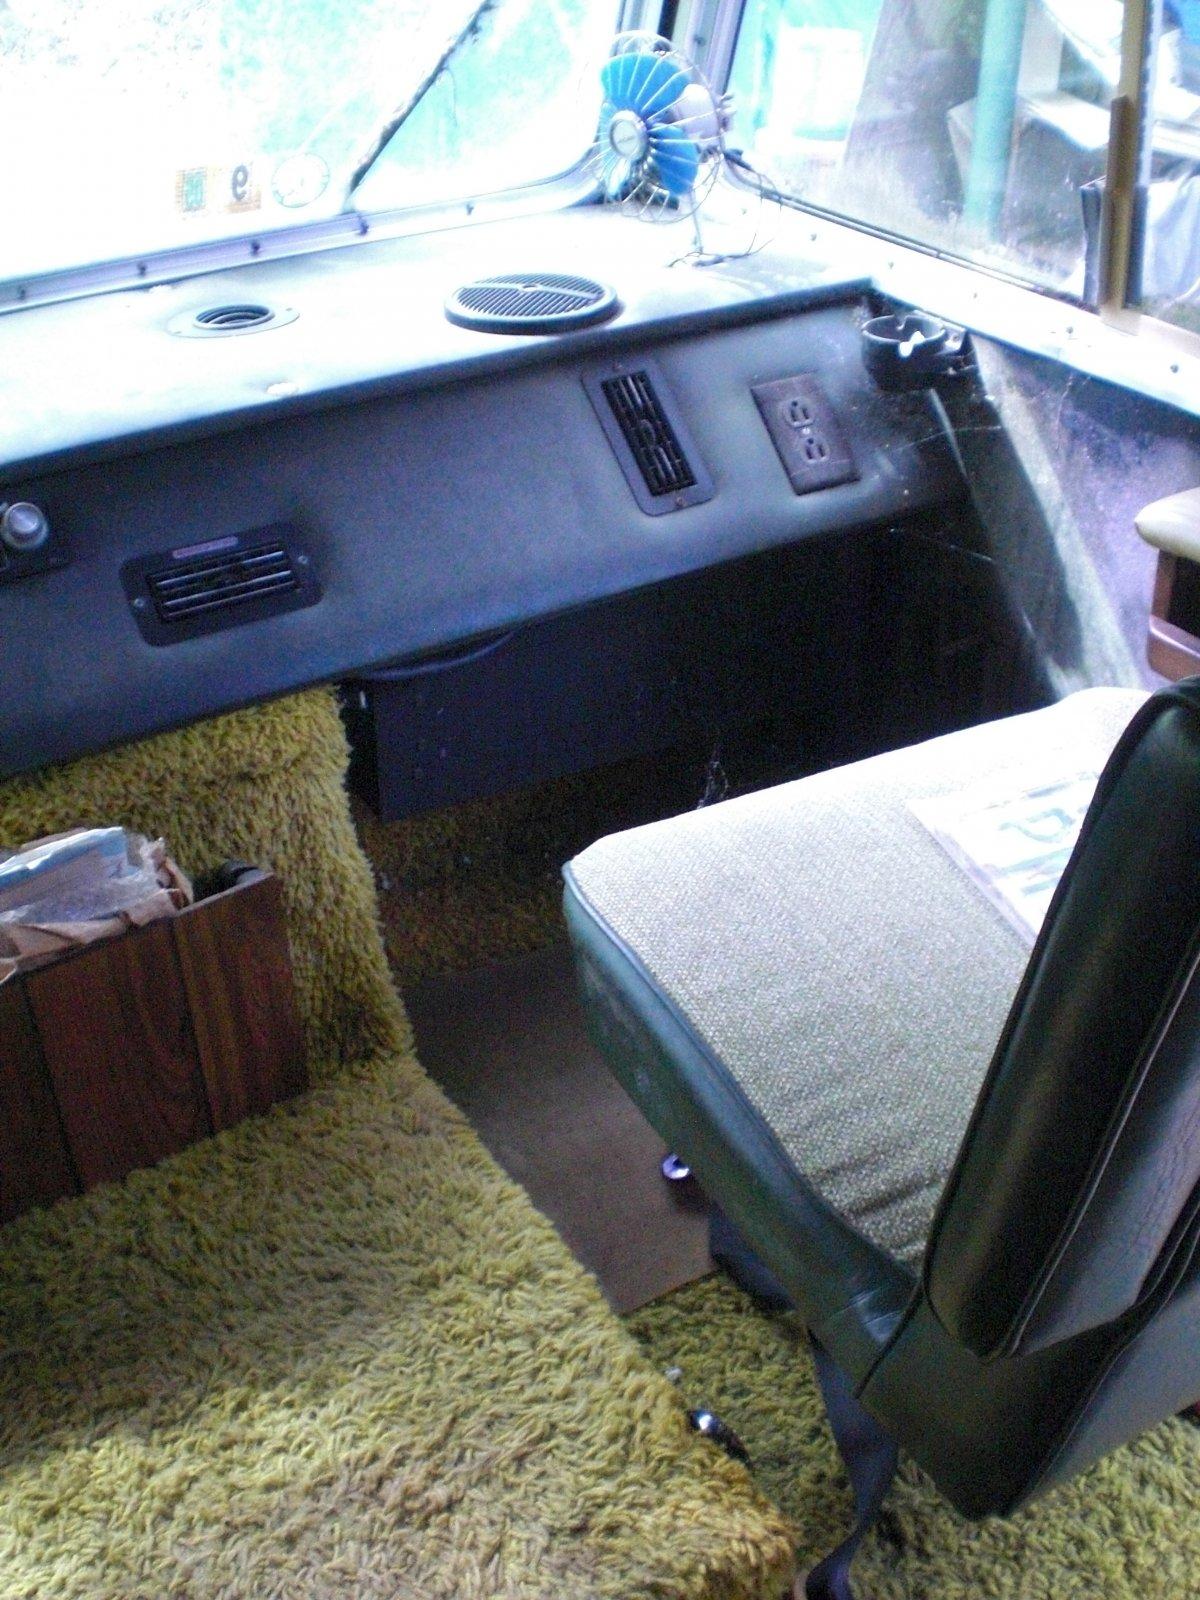 Click image for larger version  Name:passenger seat 2.jpg Views:59 Size:359.3 KB ID:9791